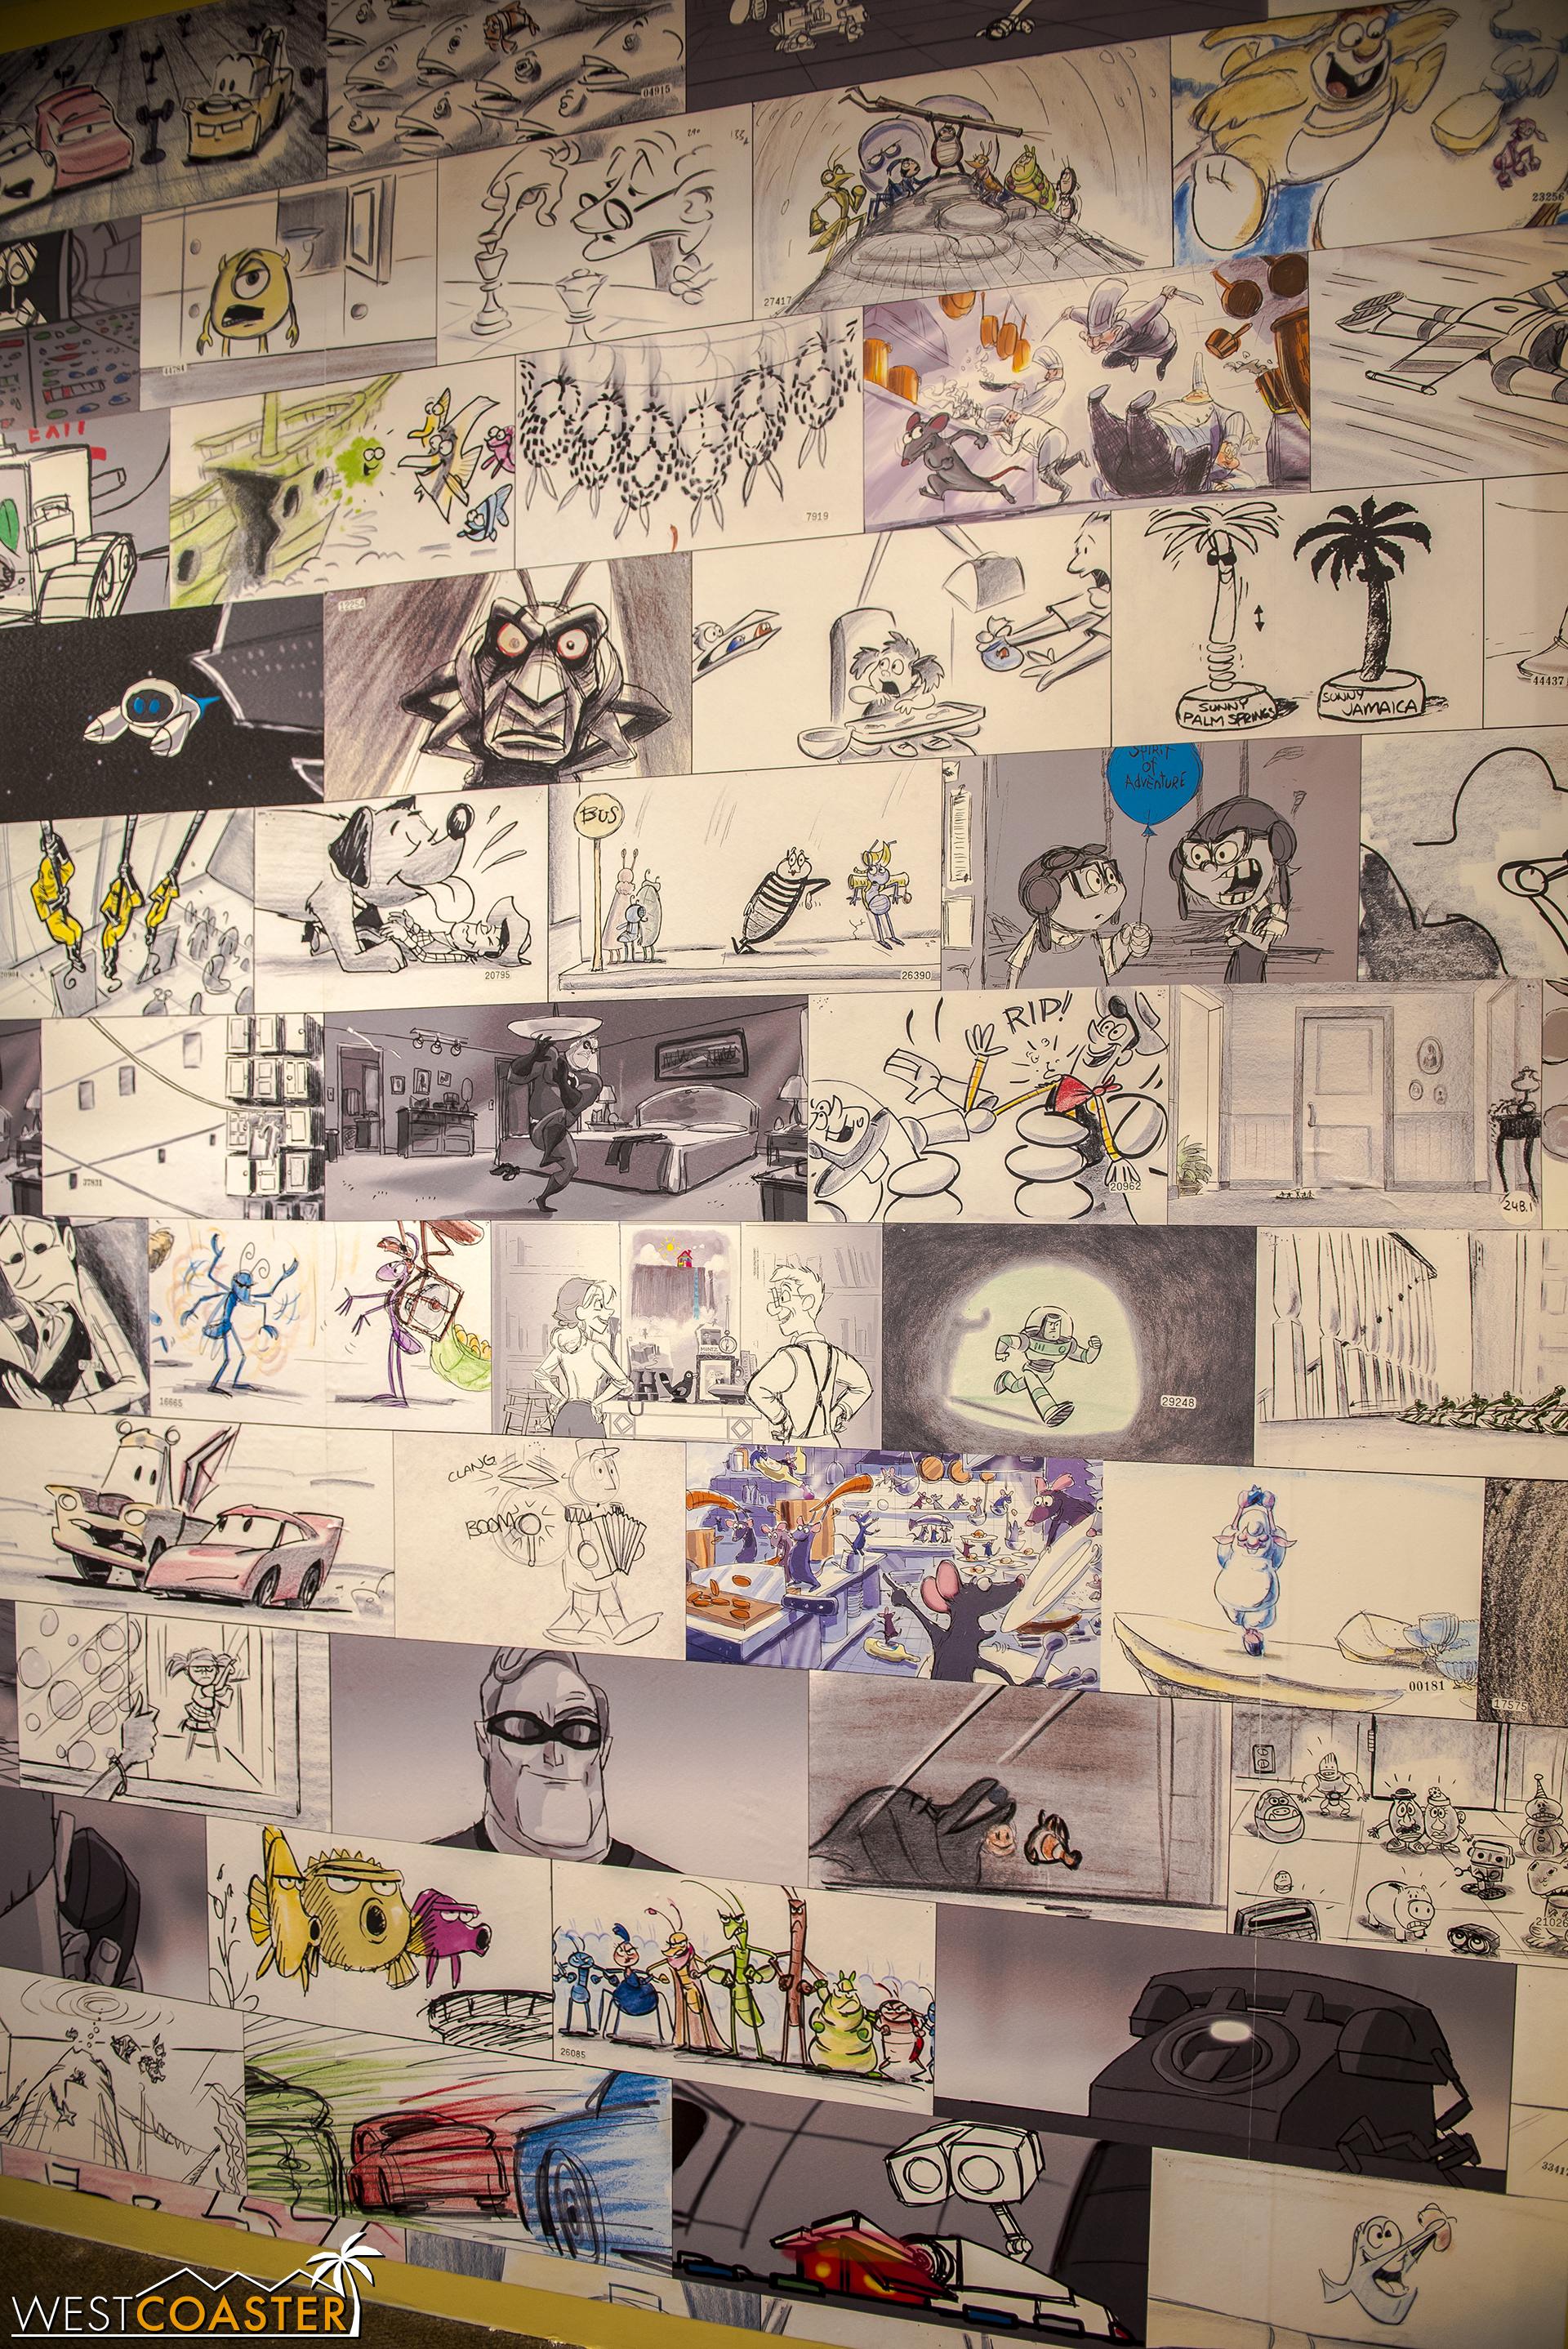 Speaking knick knacks, here's a look inside the new Knick's Knacks store at soon-to-be Pixar Pier.